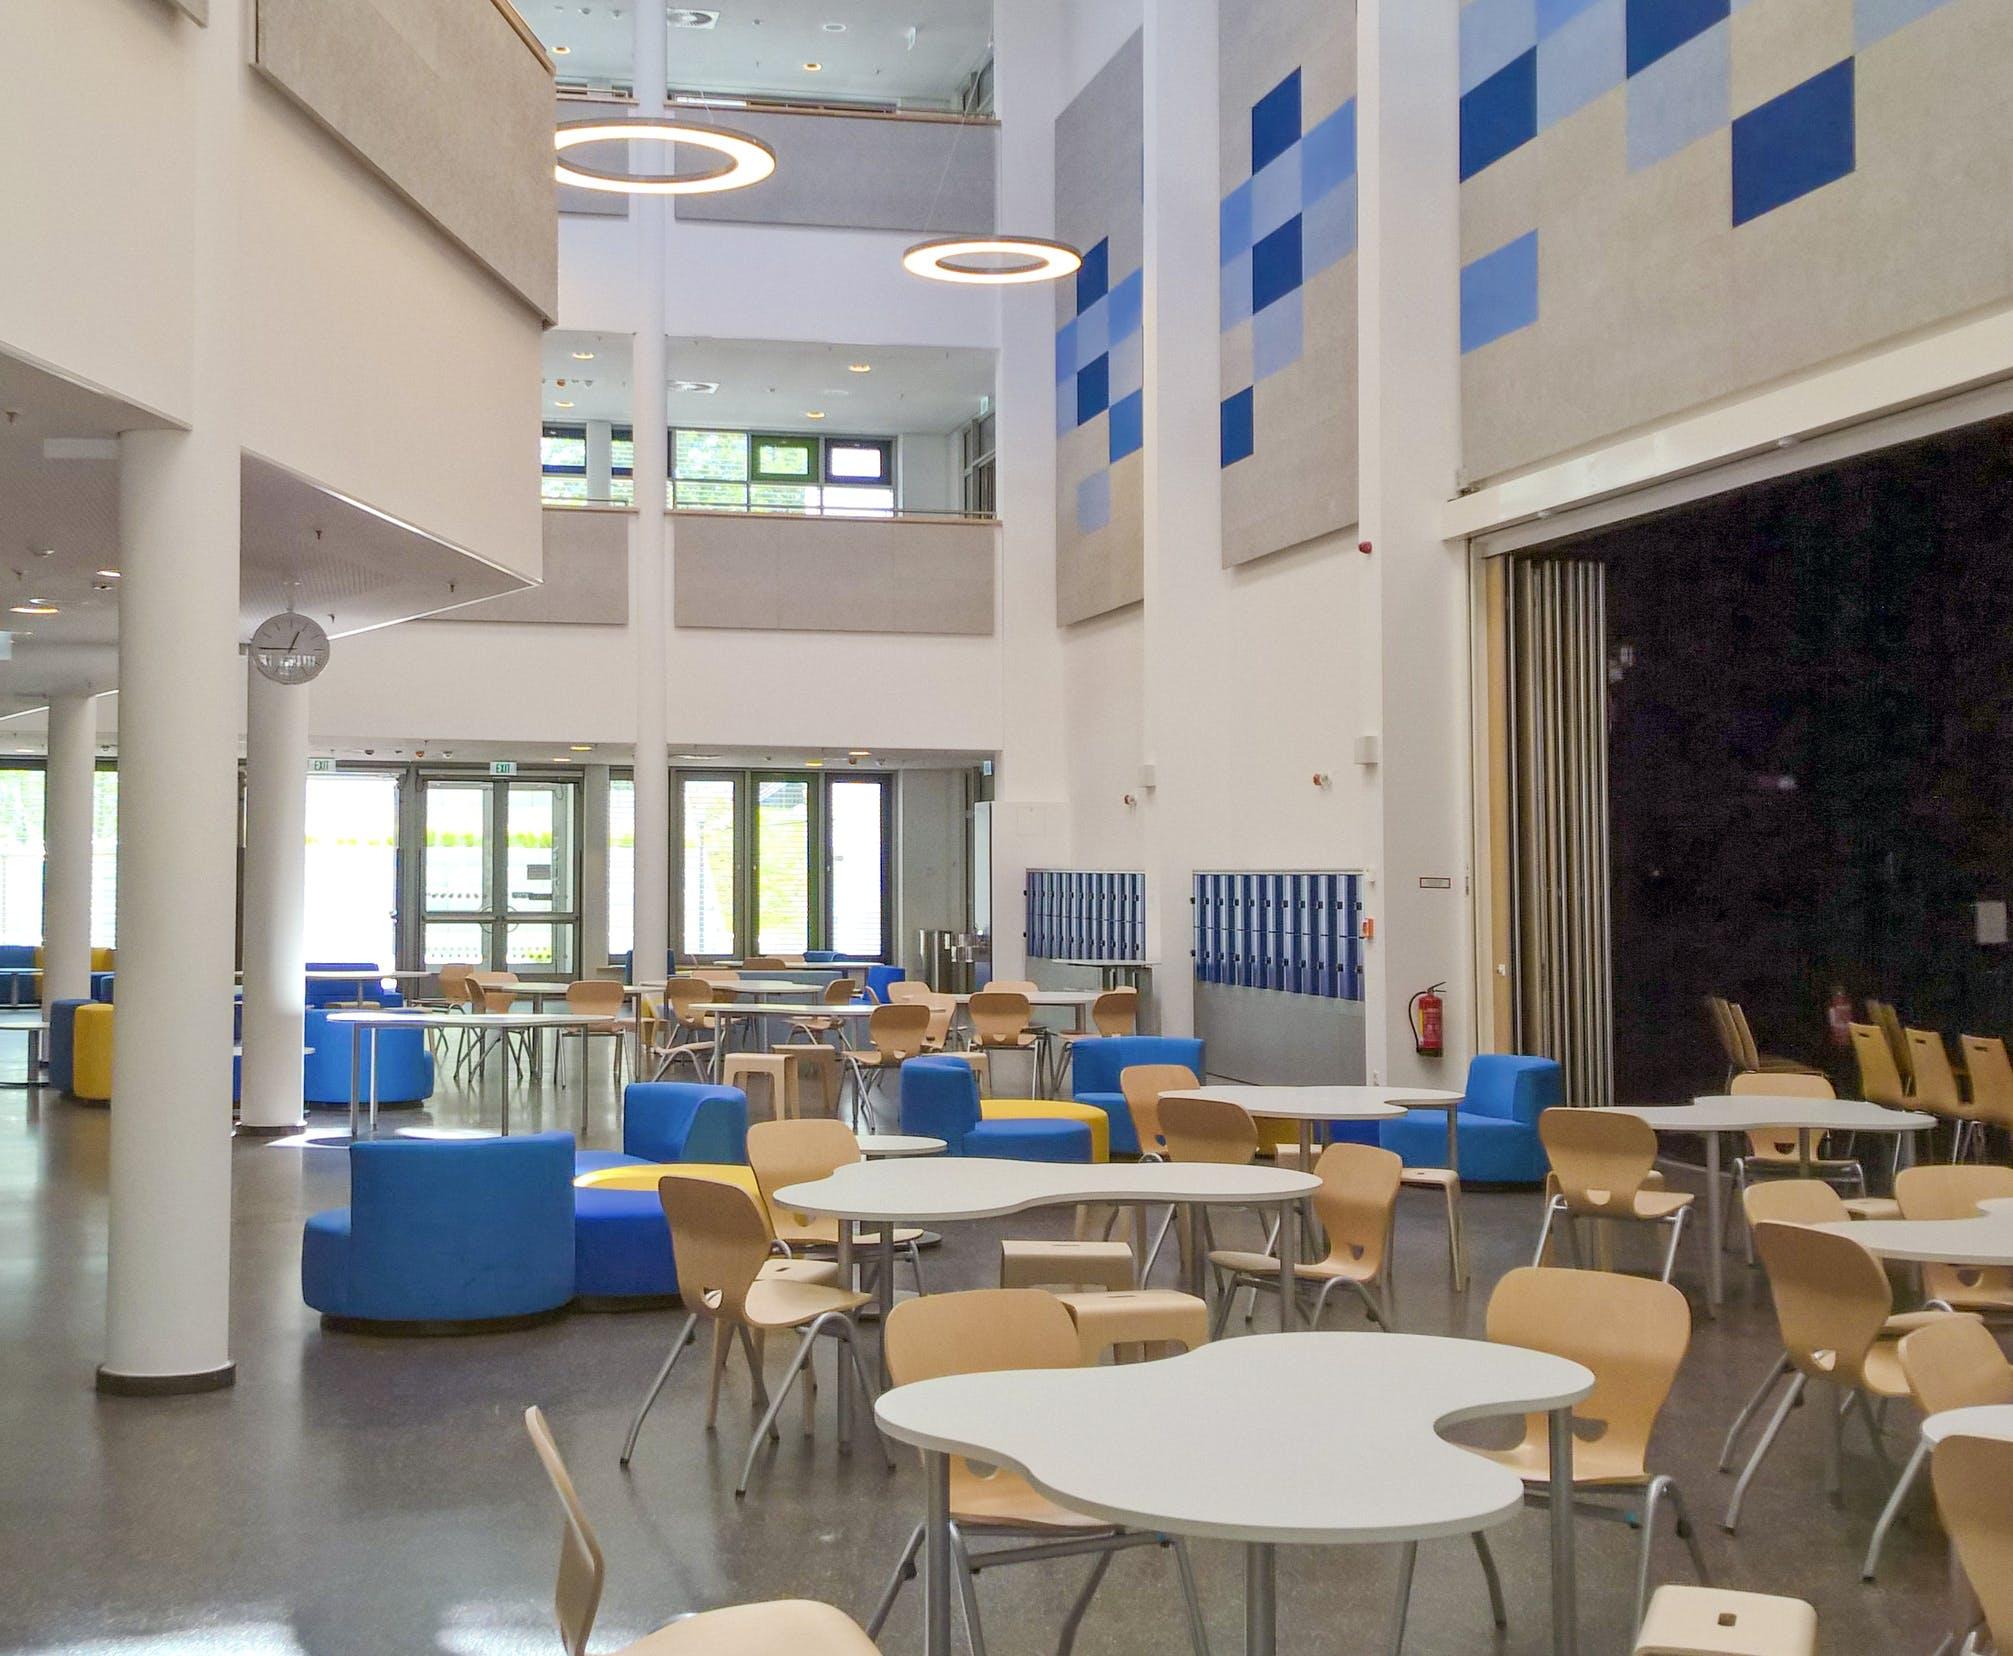 Wiesbaden High School Gallery Images